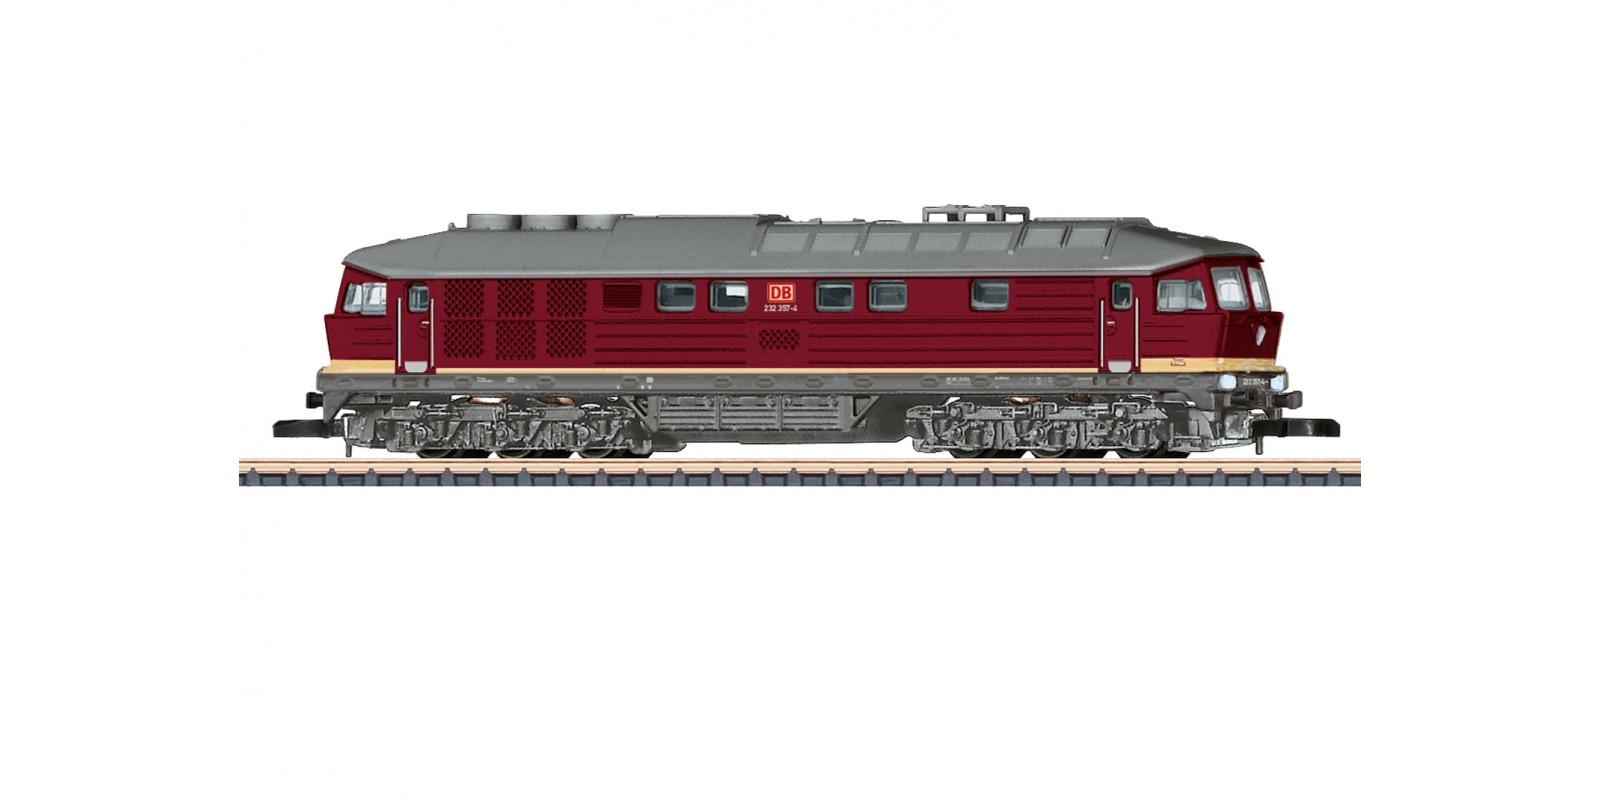 88136 Class 232 Diesel Locomotive